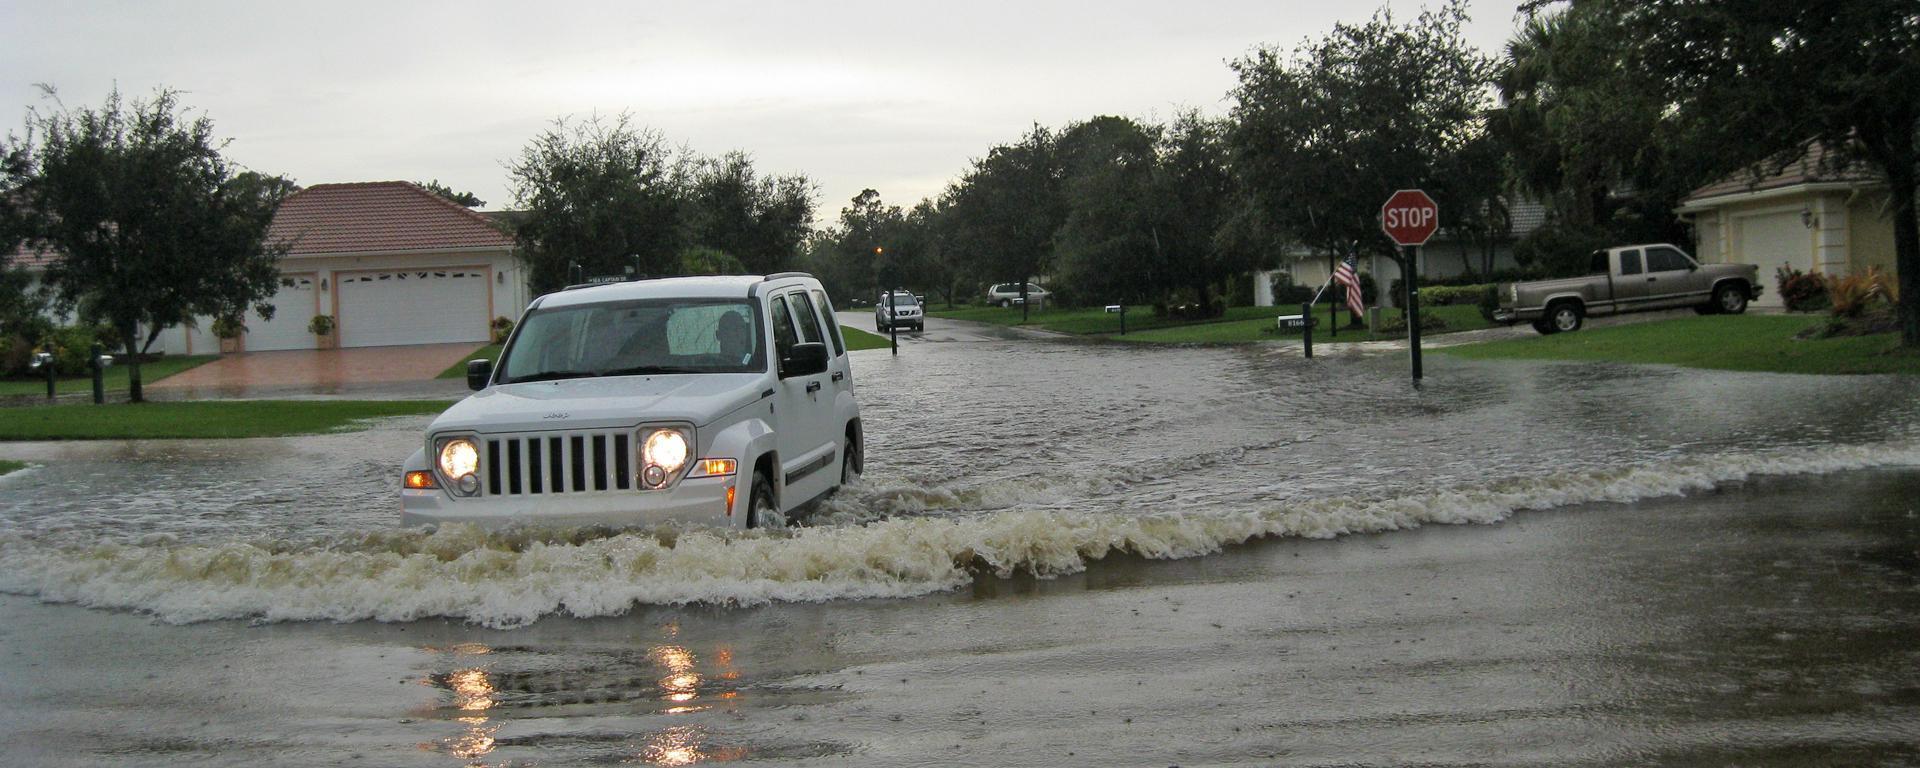 An SUV driving through a flooded neighborhood